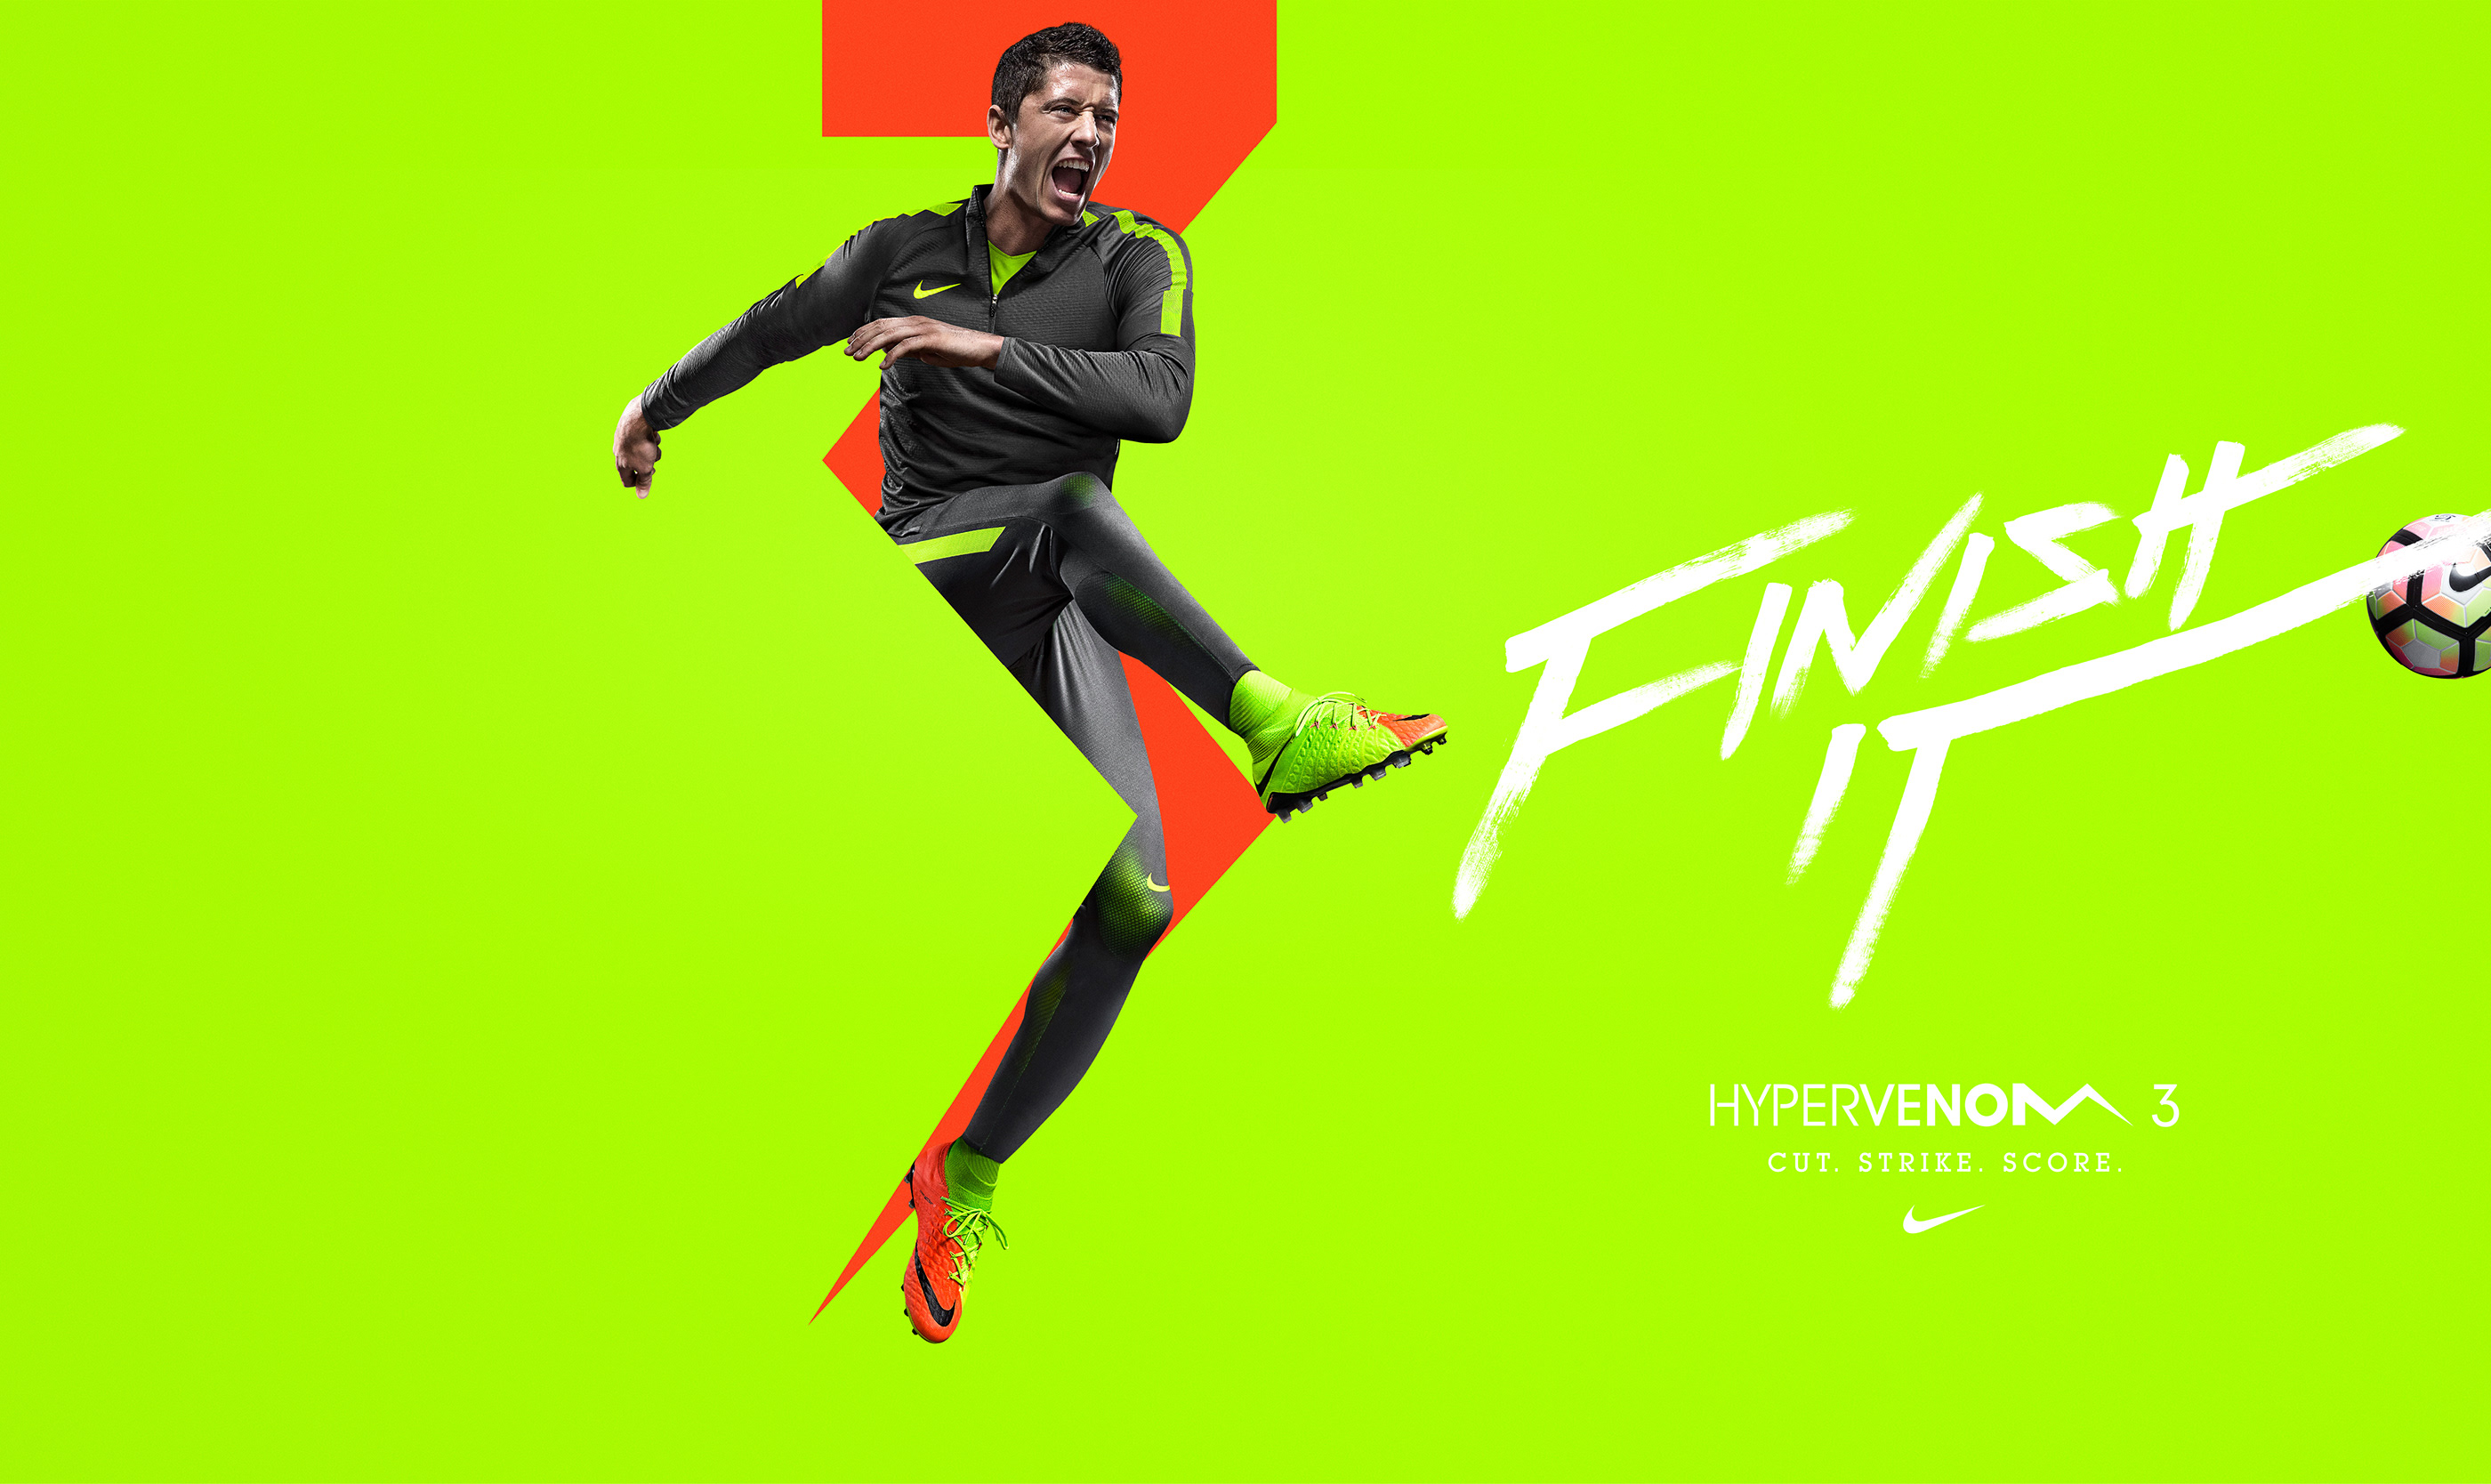 best service eebf0 72262 Nike / Hypervenom 3 on Behance